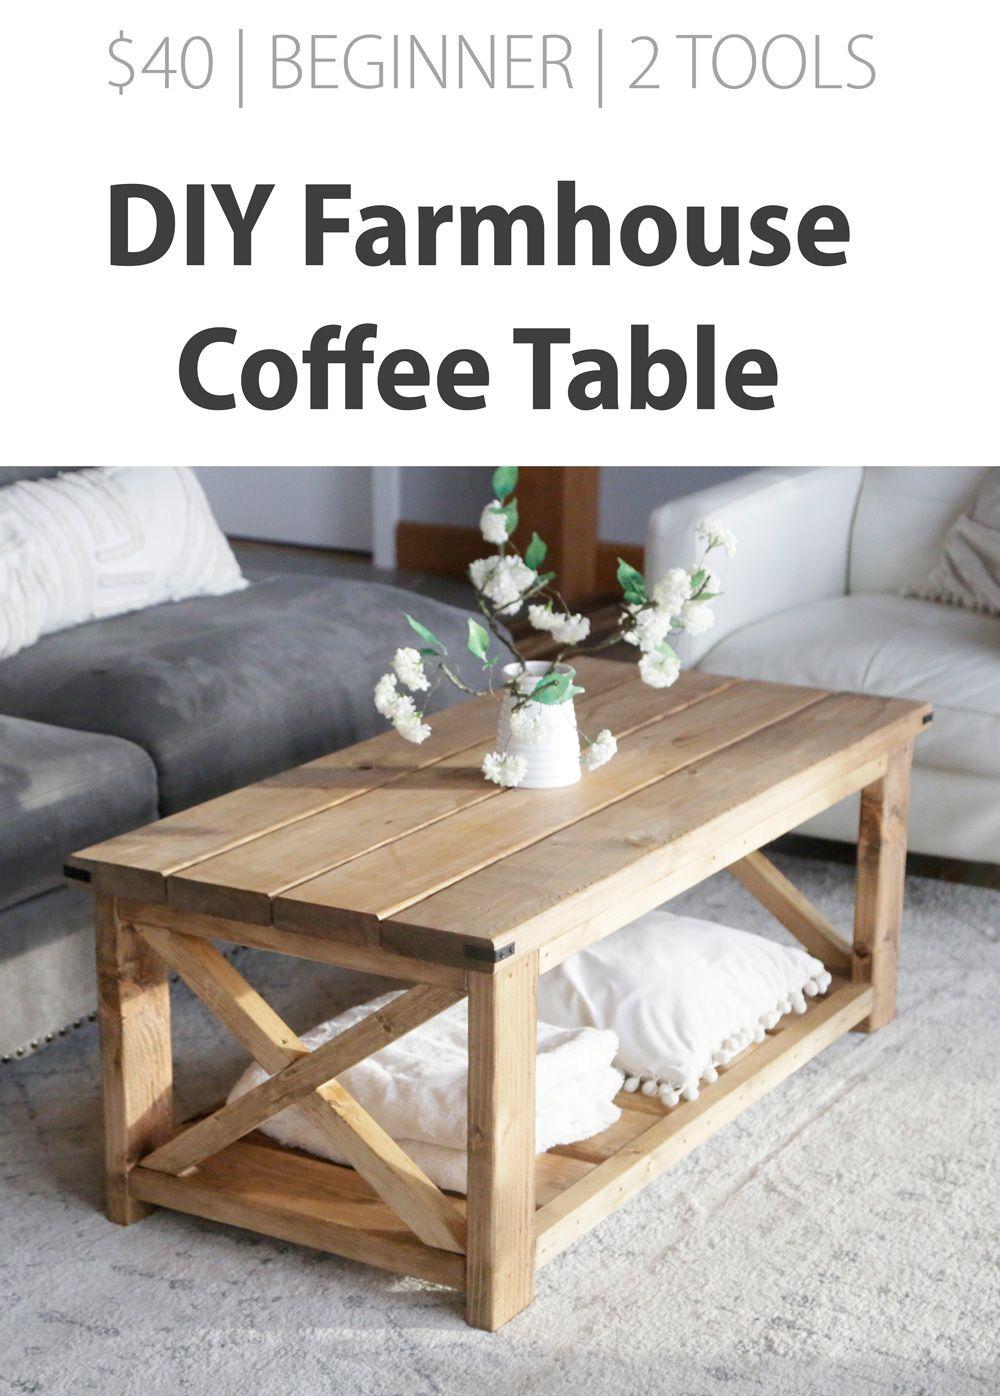 Farmhouse Coffee Table Beginner Under 40 Coffee Table Plans